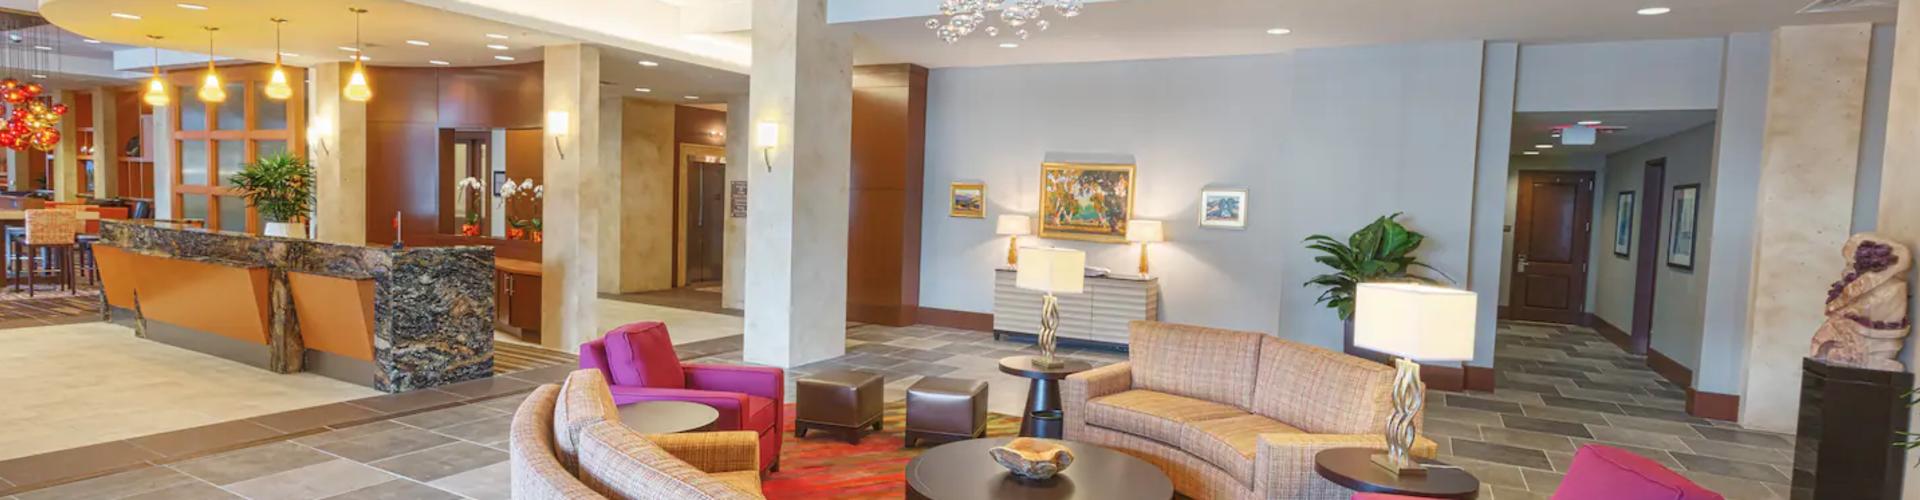 Hoteles Económicos en Houston